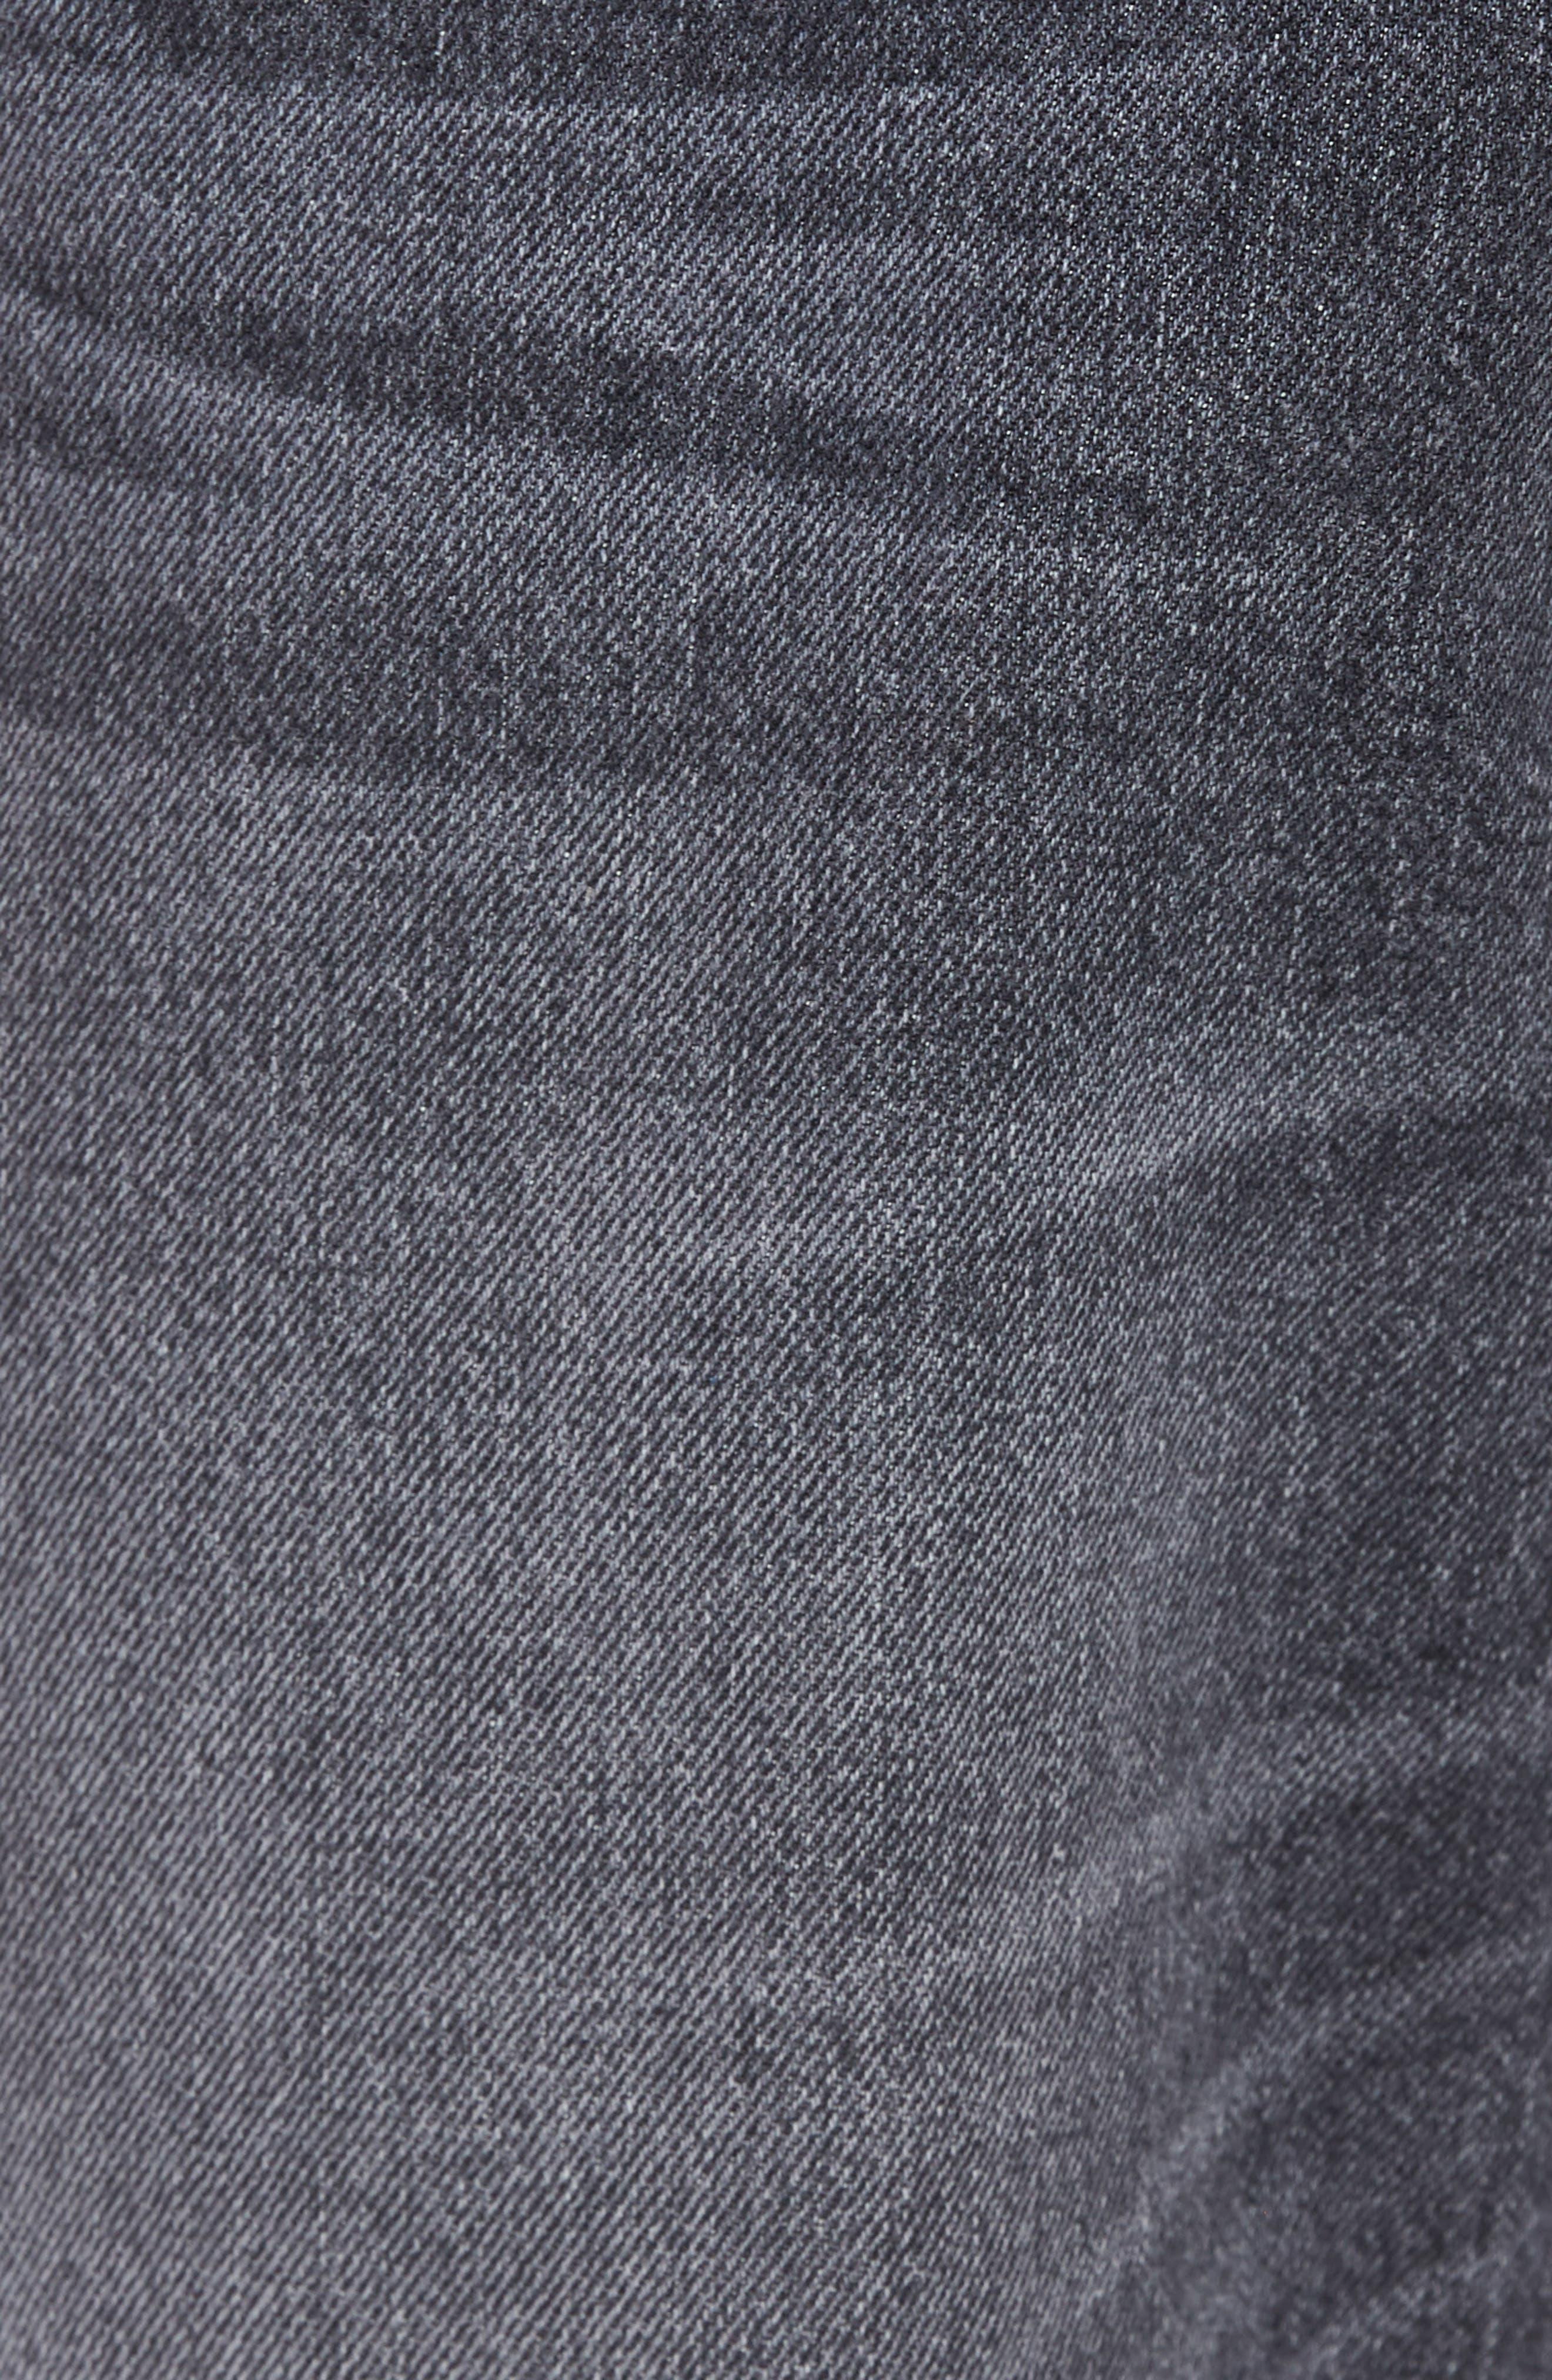 Dixon Straight Leg Jeans,                             Alternate thumbnail 5, color,                             Hurricane